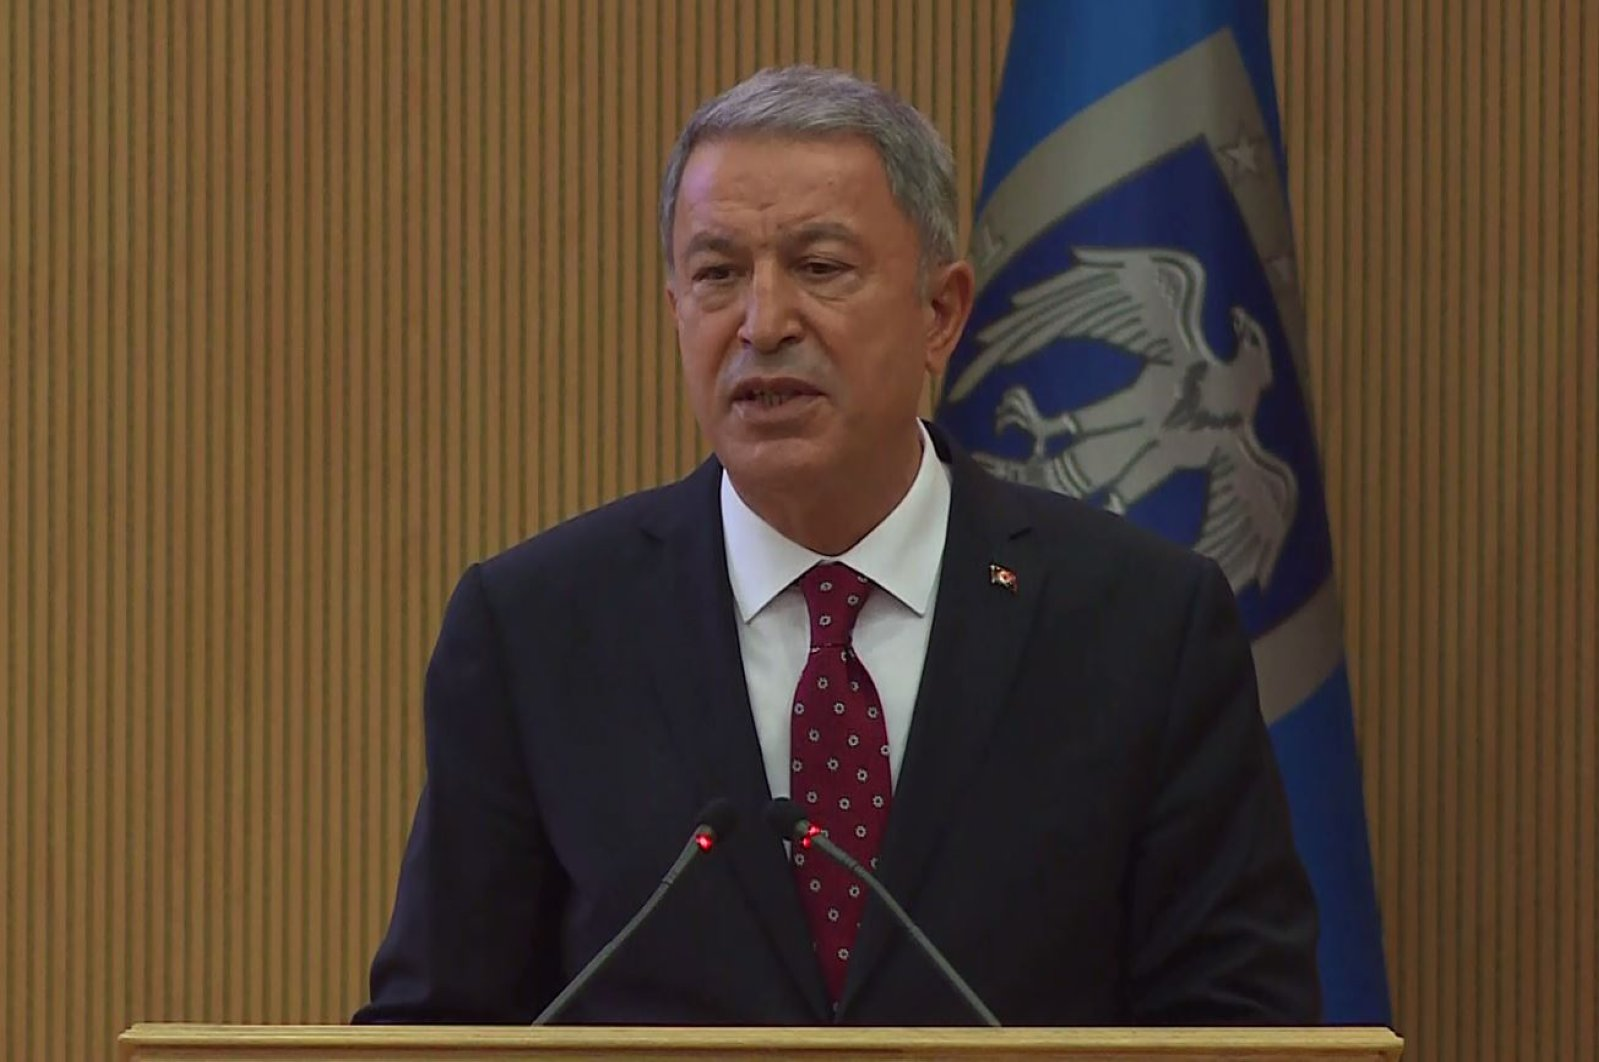 National Defense Minister Hulusi Akar during a speech in Ankara, July 15, 2020. (DHA Photo)